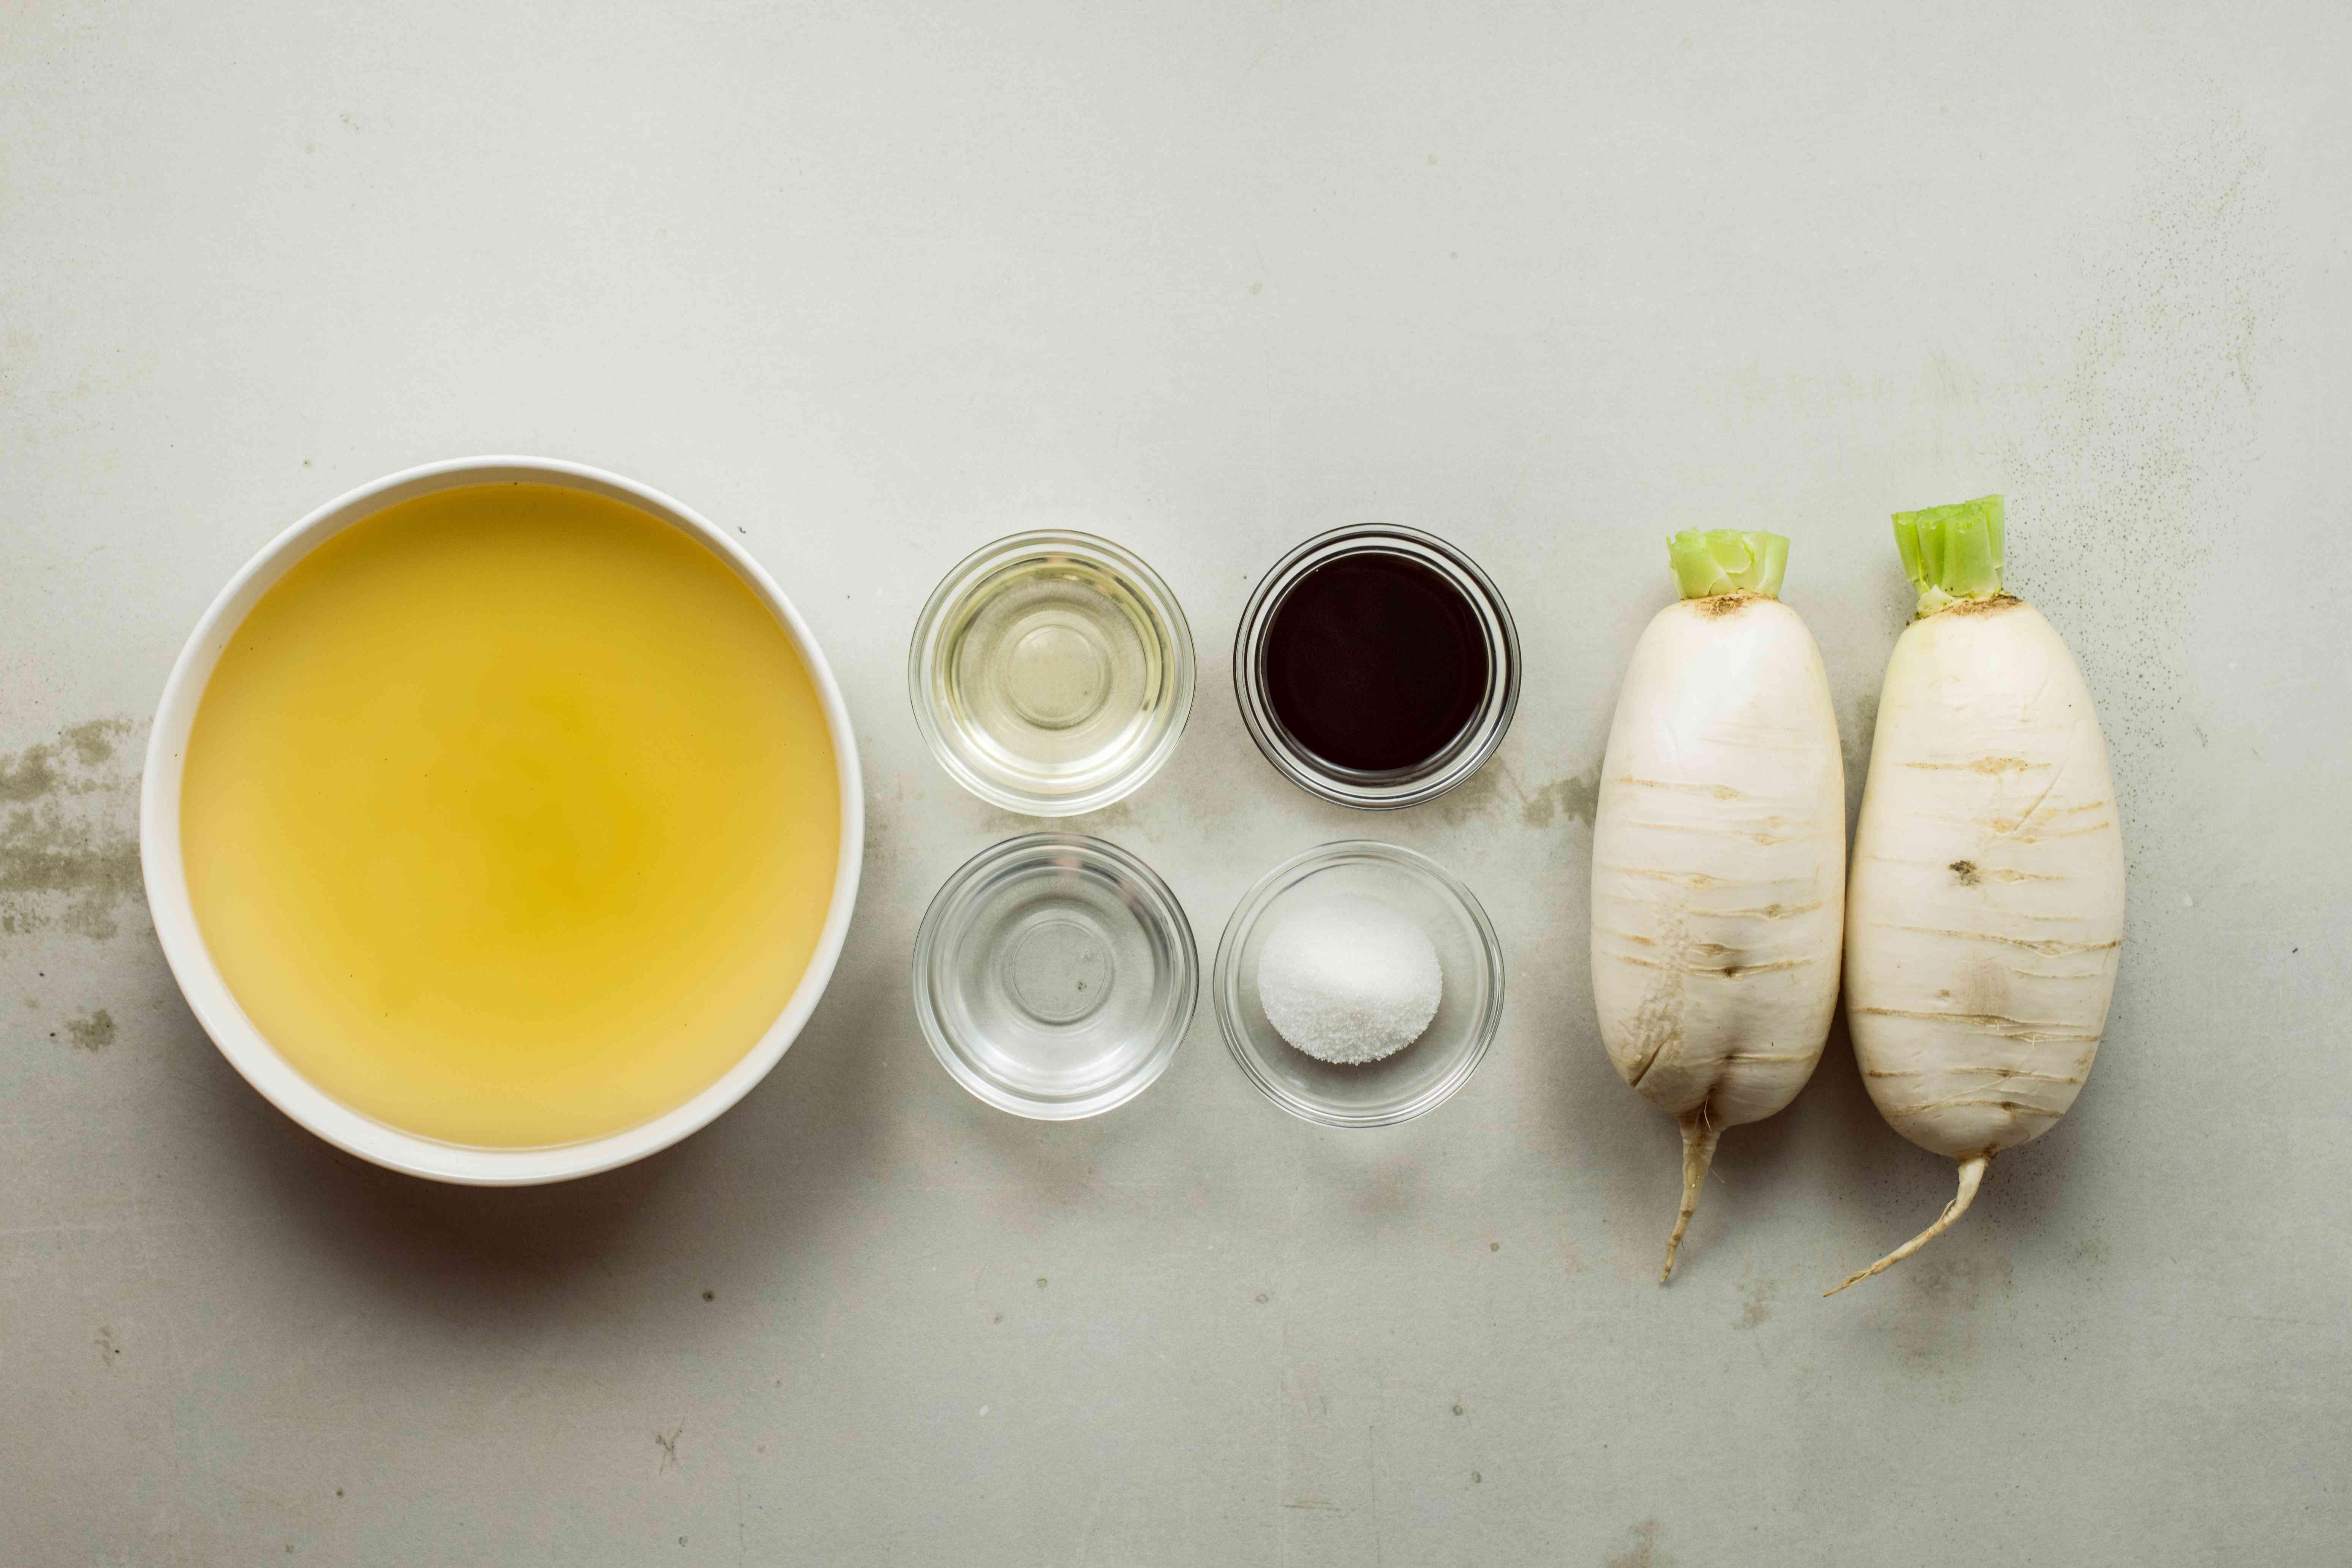 Ingredients for braised daikon